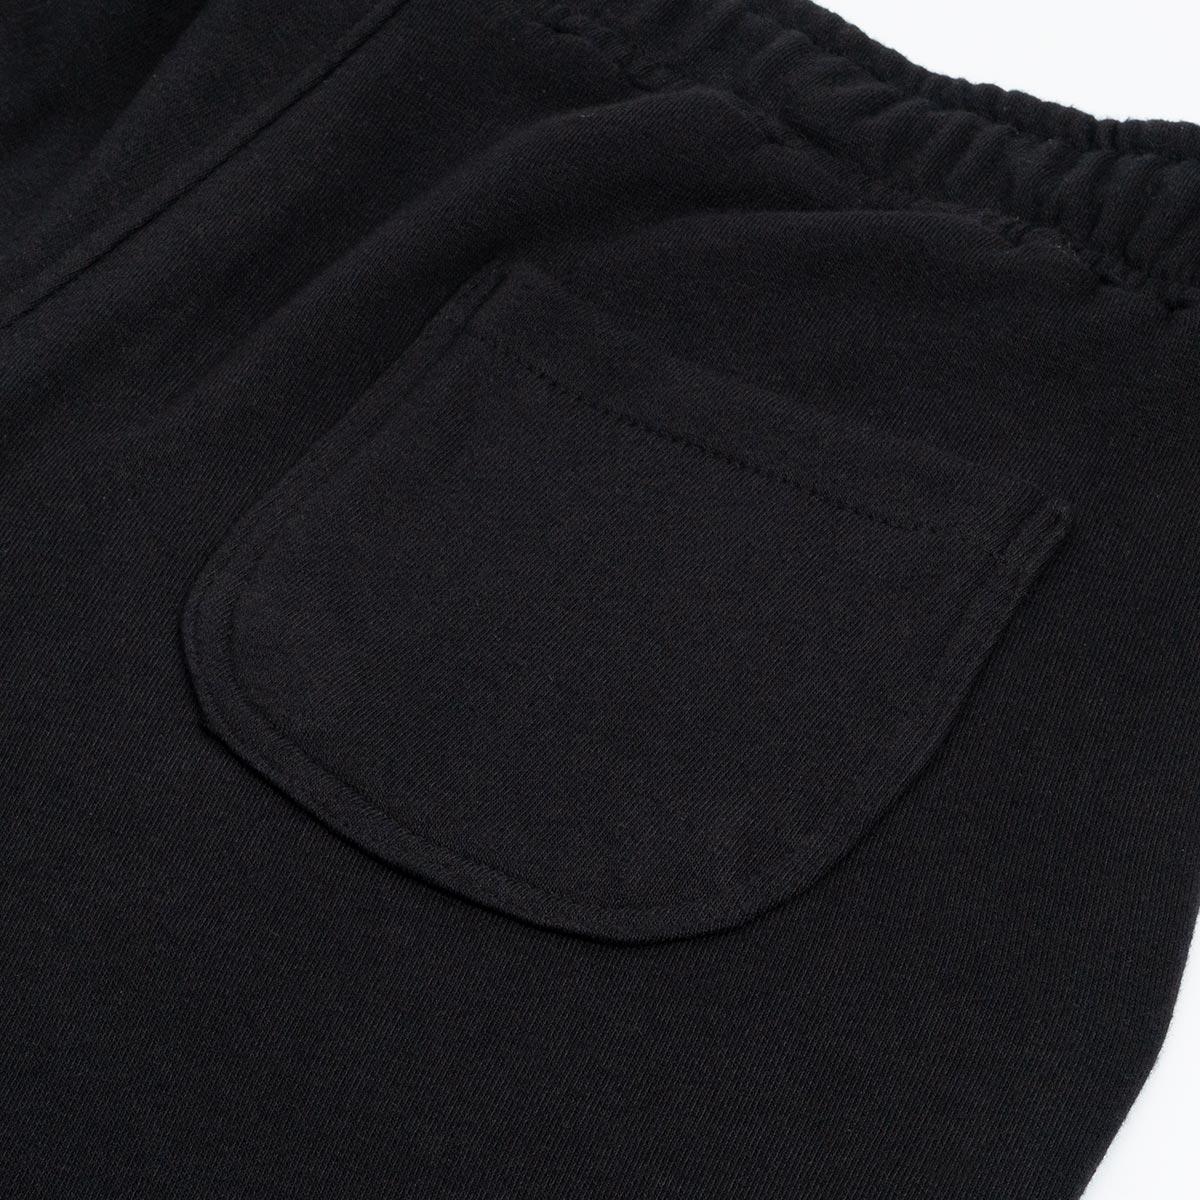 Calça High Sweatpants Cargo Black